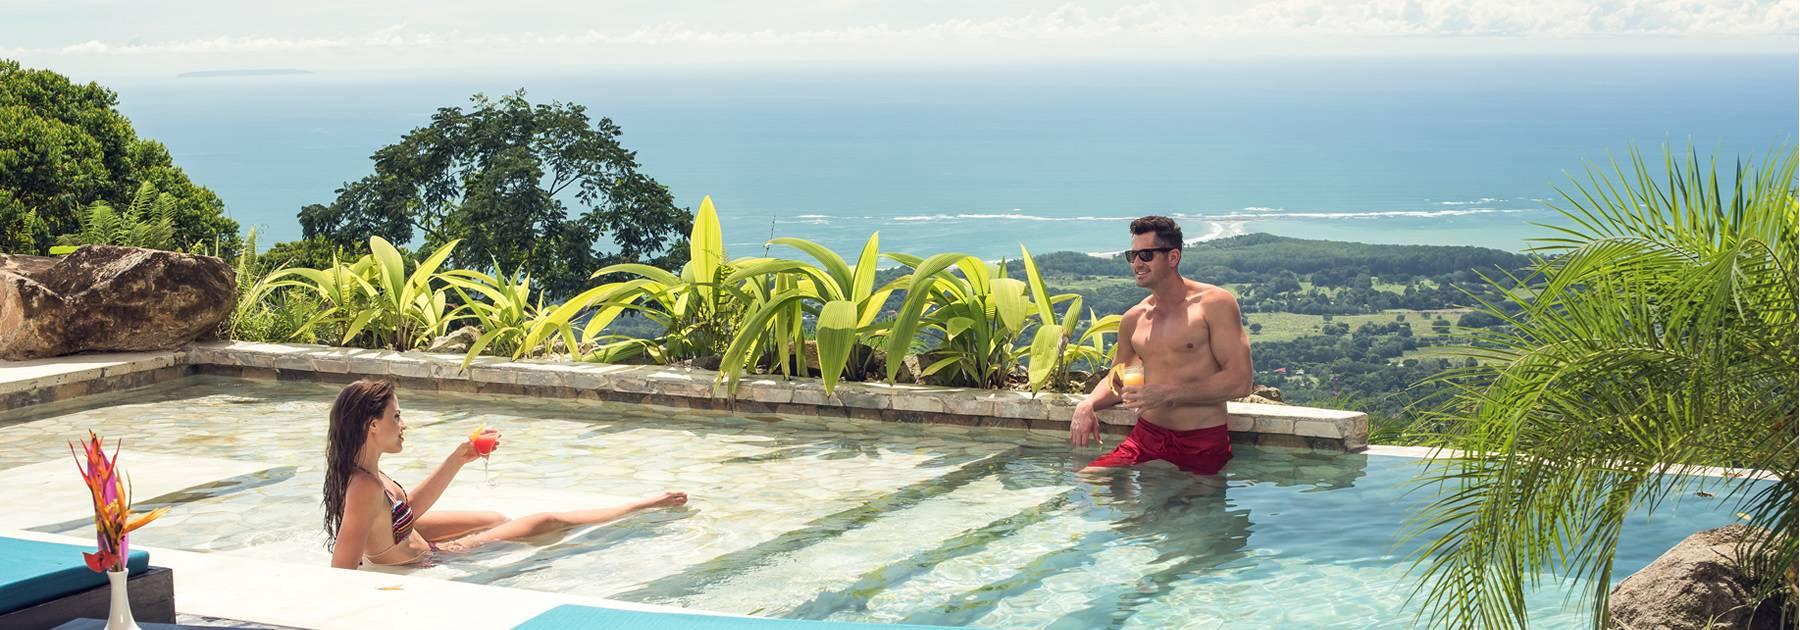 Boutique hotel yoga retreats costa rica vista celestial for Luxury vacation costa rica